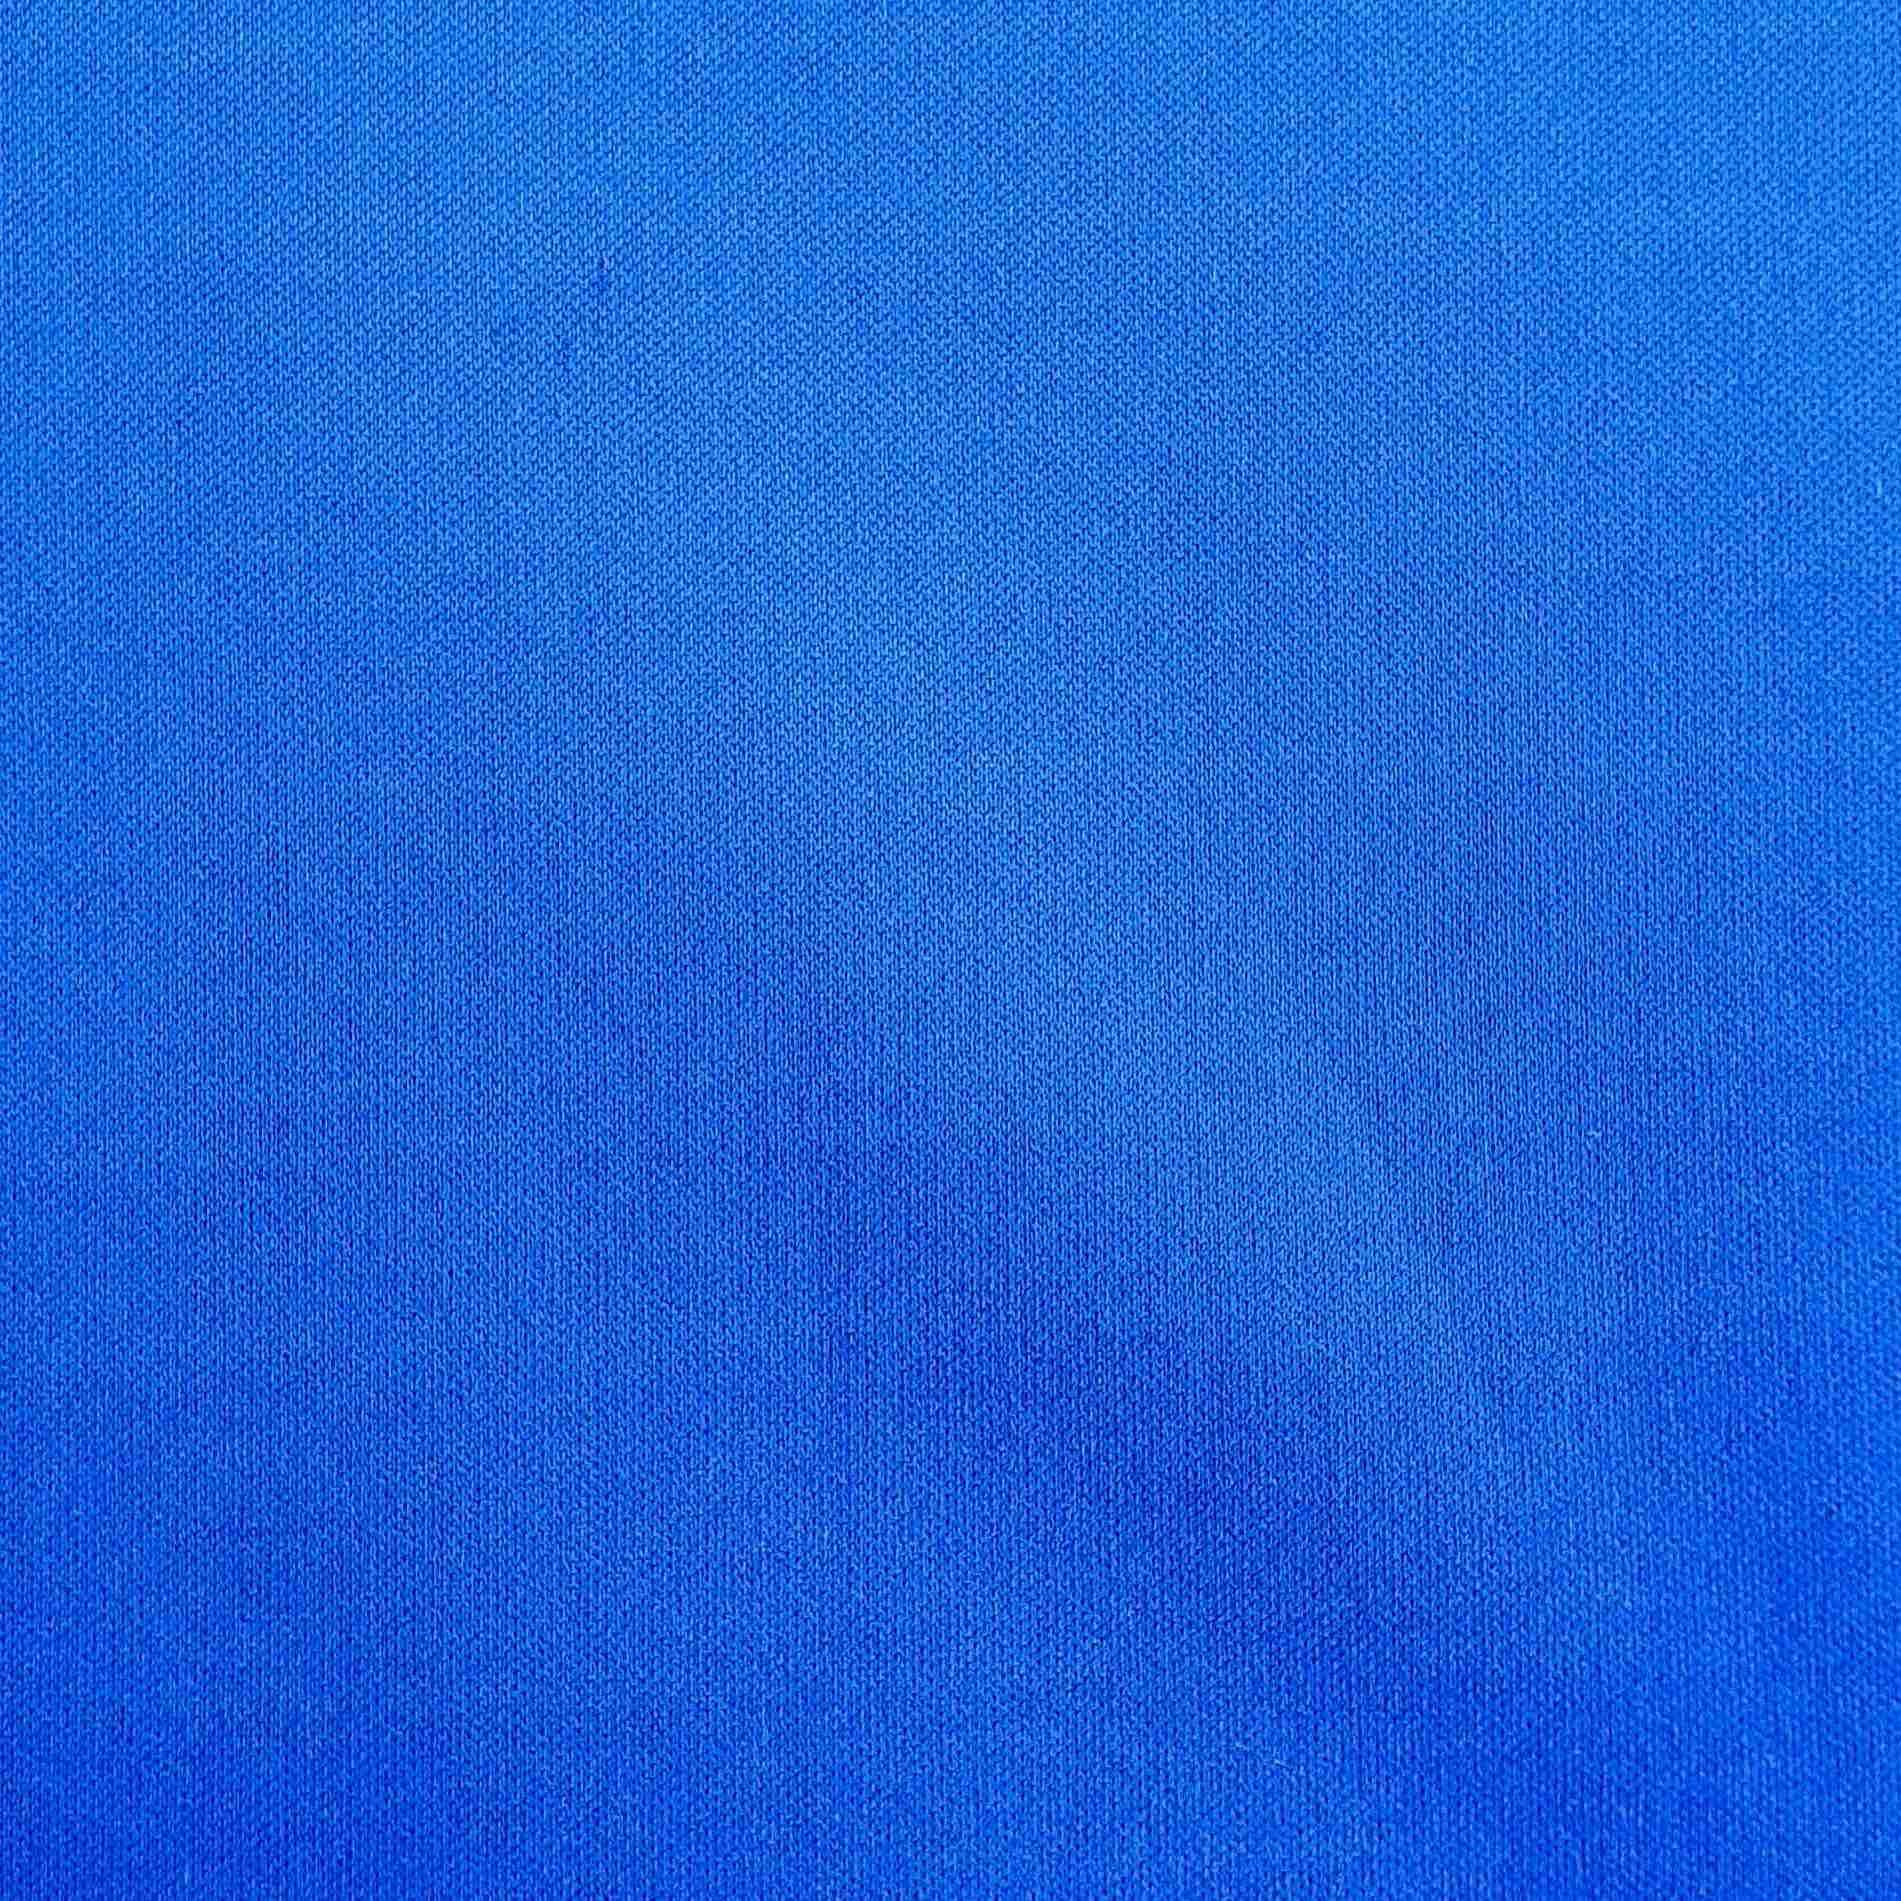 PUL42 Bleu royal